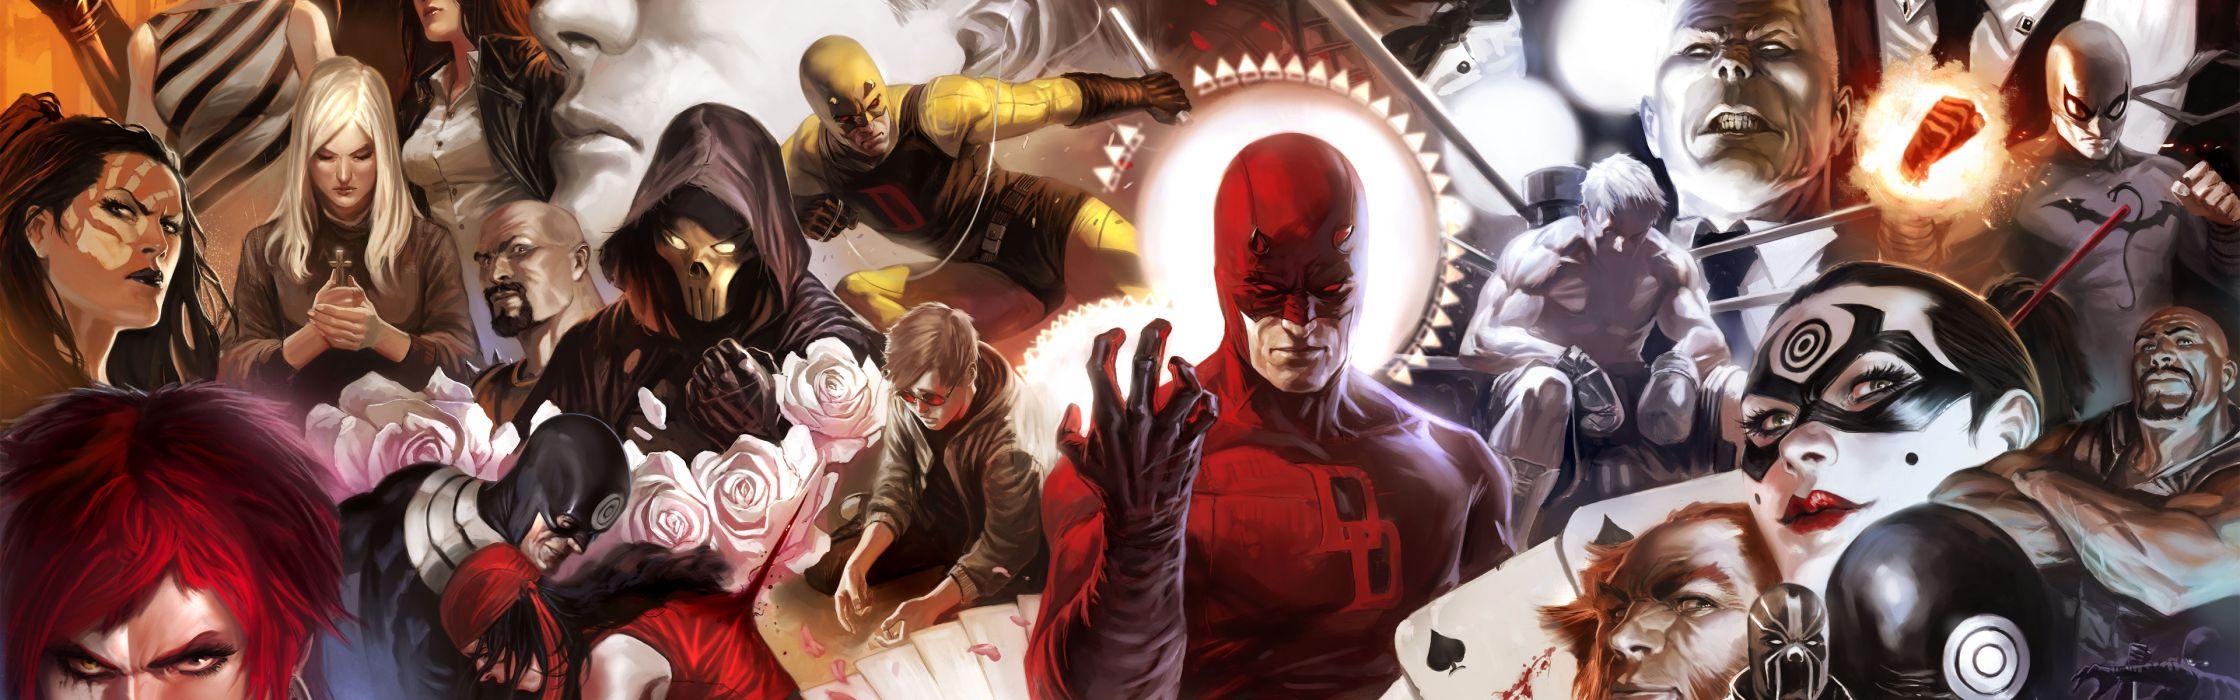 Daredevil marvel comics bullseye typhoid mary wallpaper